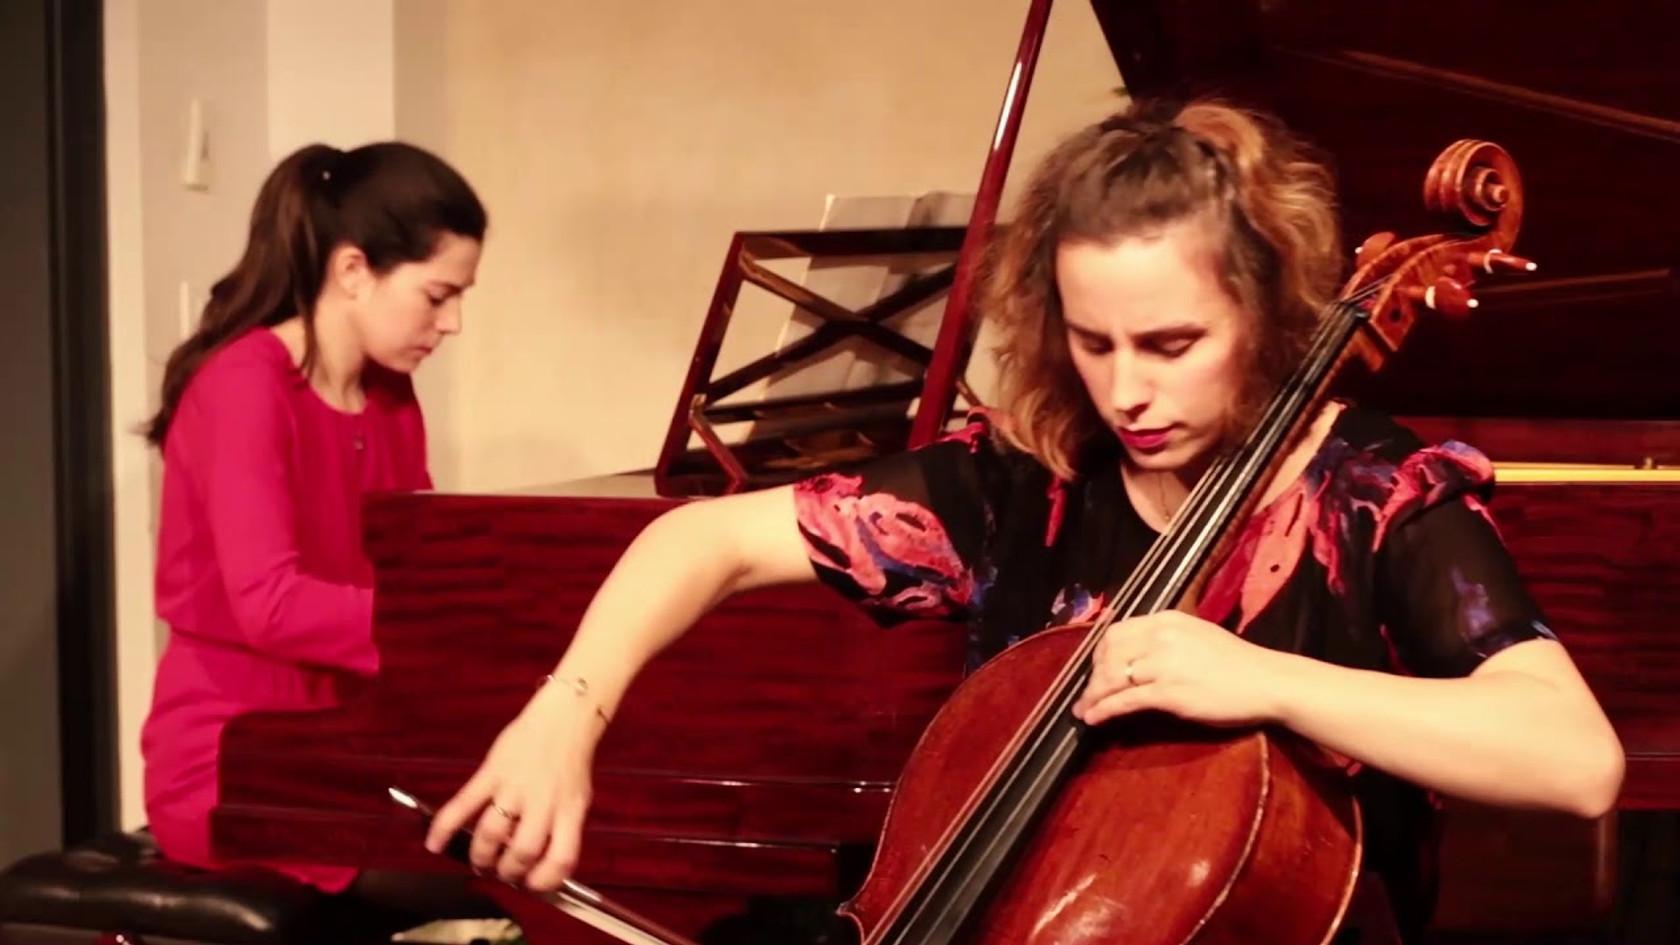 J. Brahms - Sonate Op. 38 - Duo Neria (Natacha Colmez-Collard, violoncelle - Camille Belin, piano)